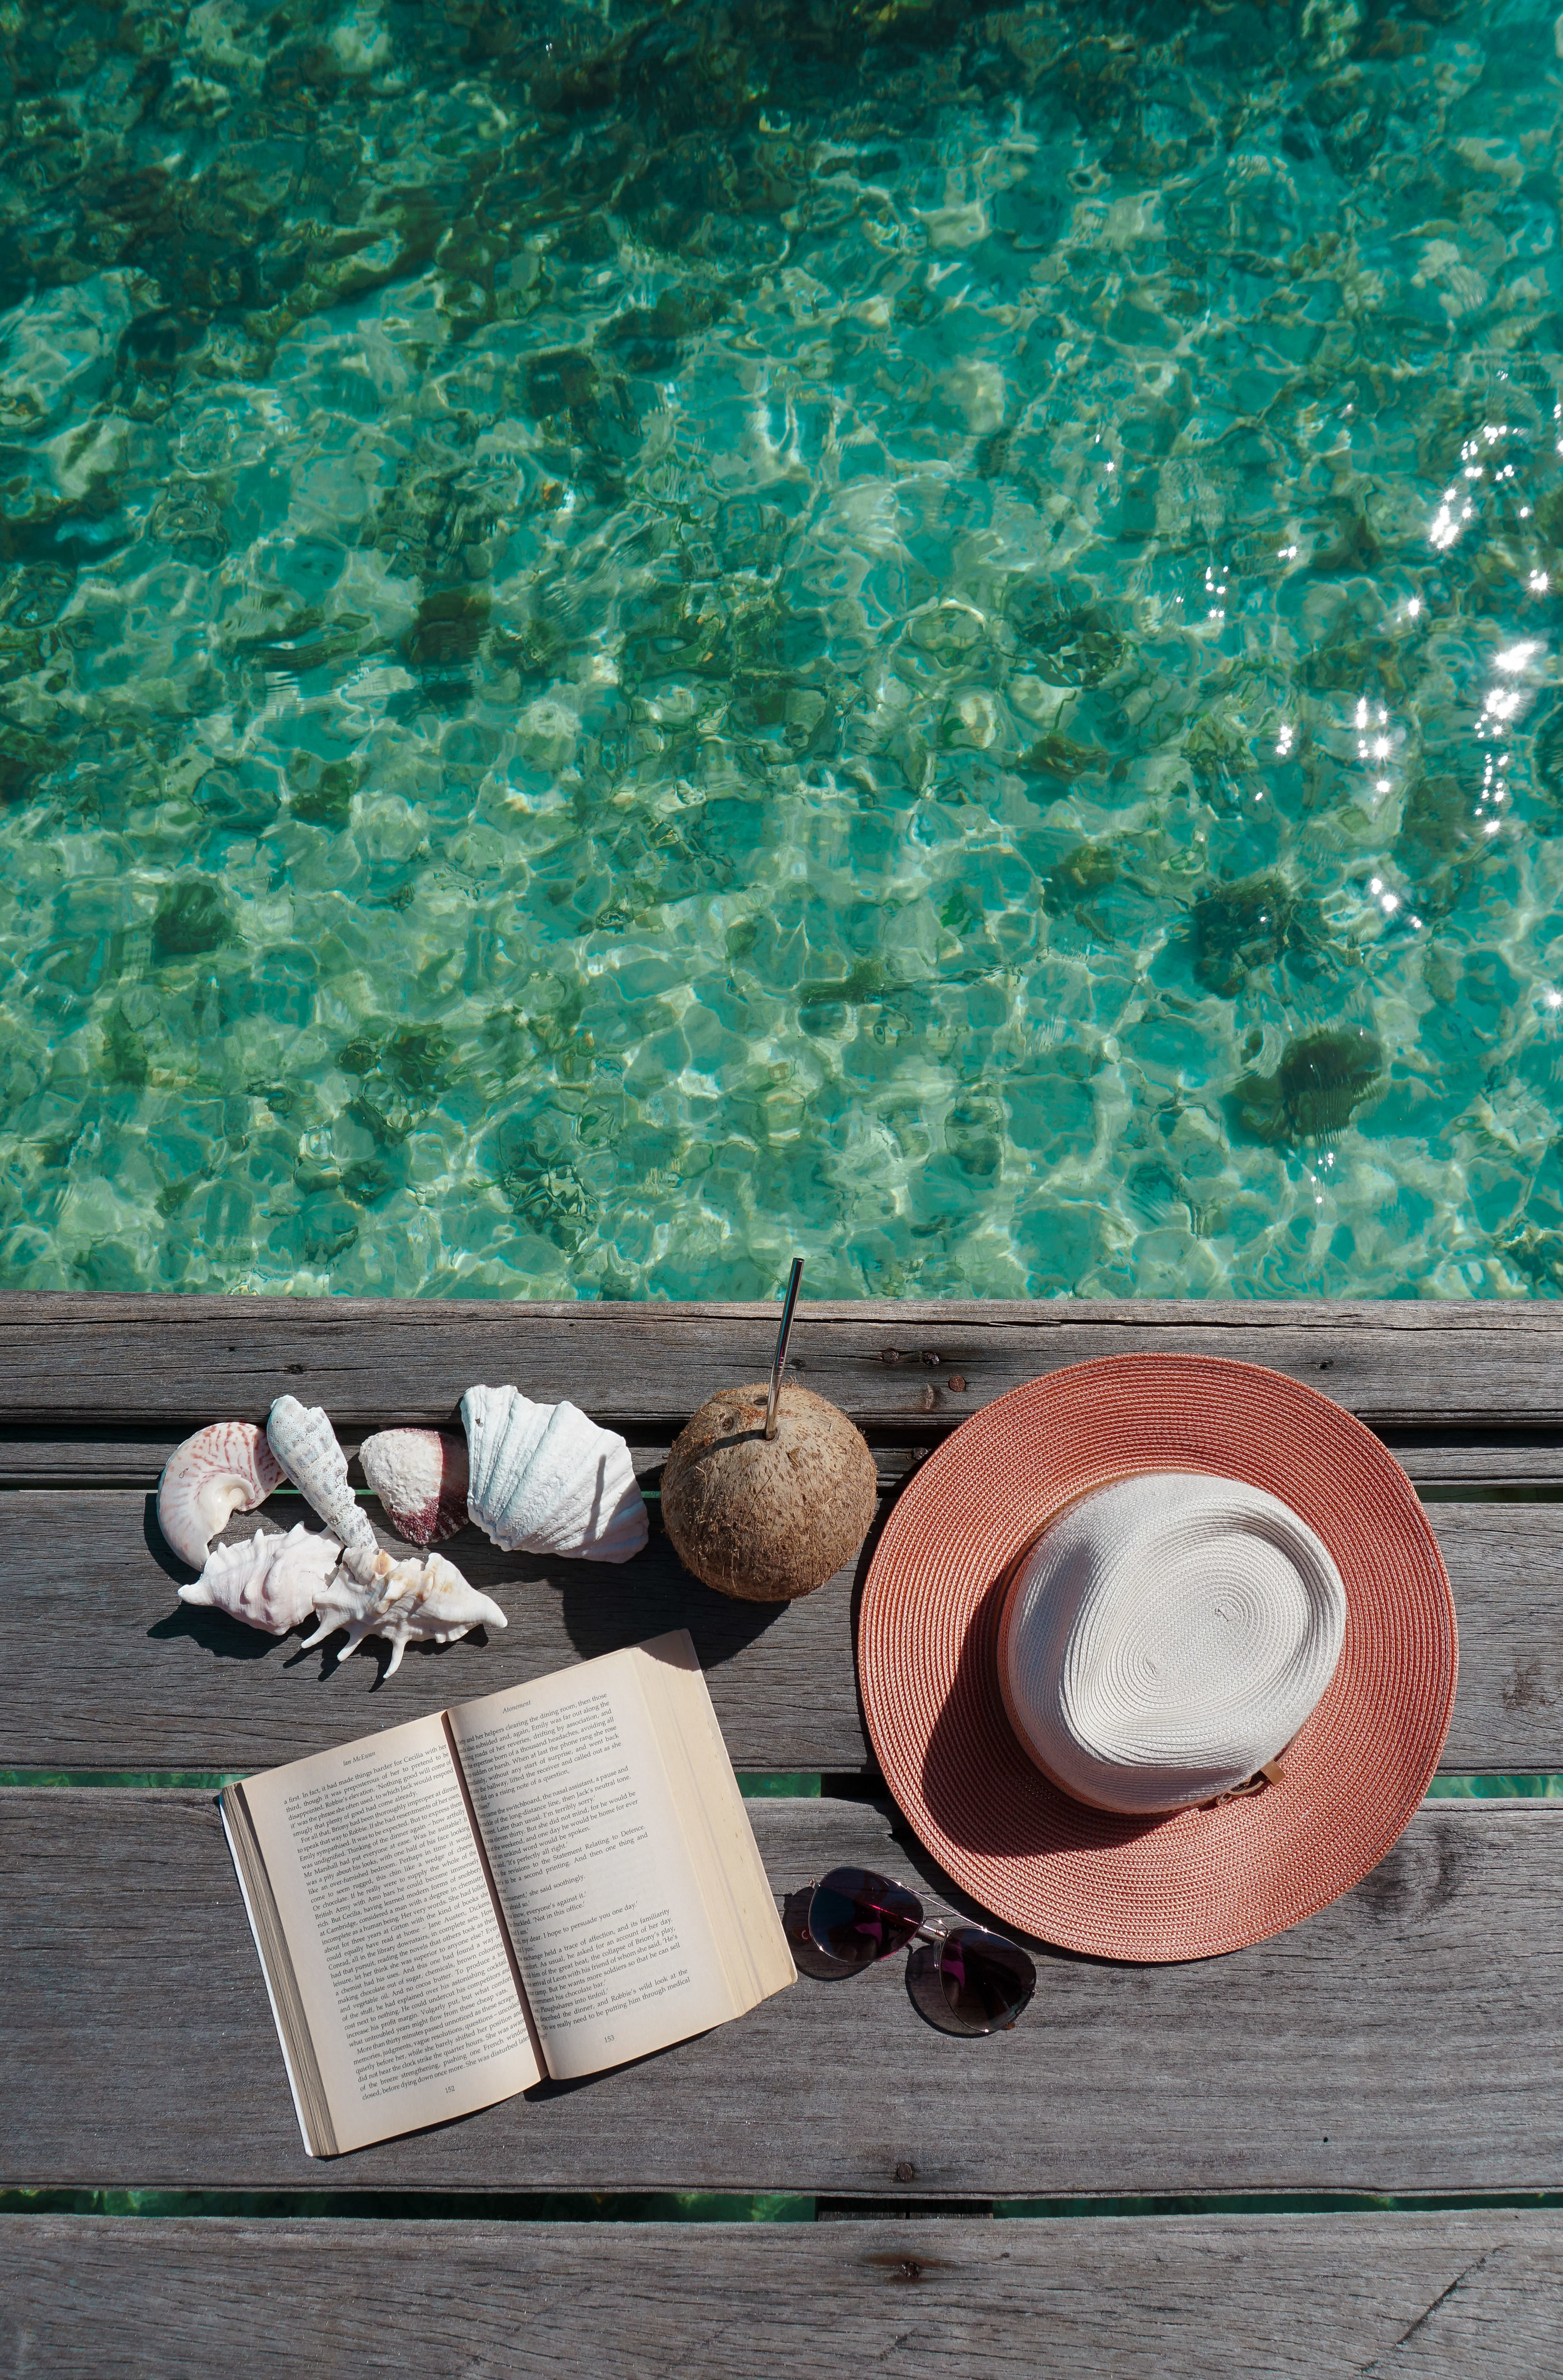 curio.trips.indonesia.raja.ampat.private.island.book.coconut.portrait.jpg